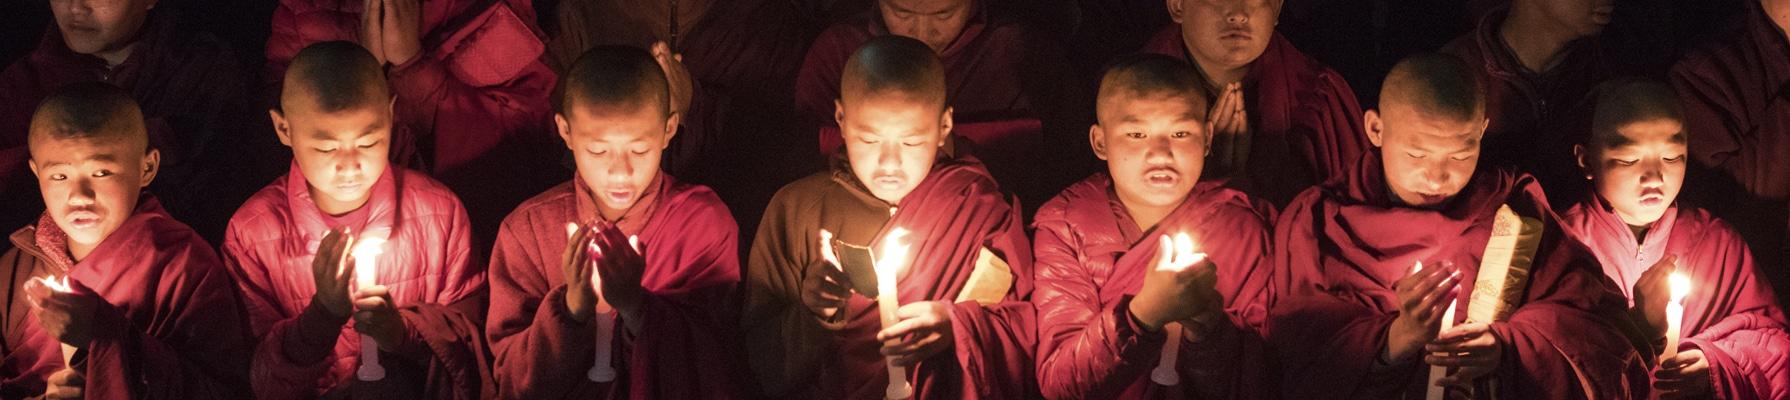 novice monks at prayer in Bhutan